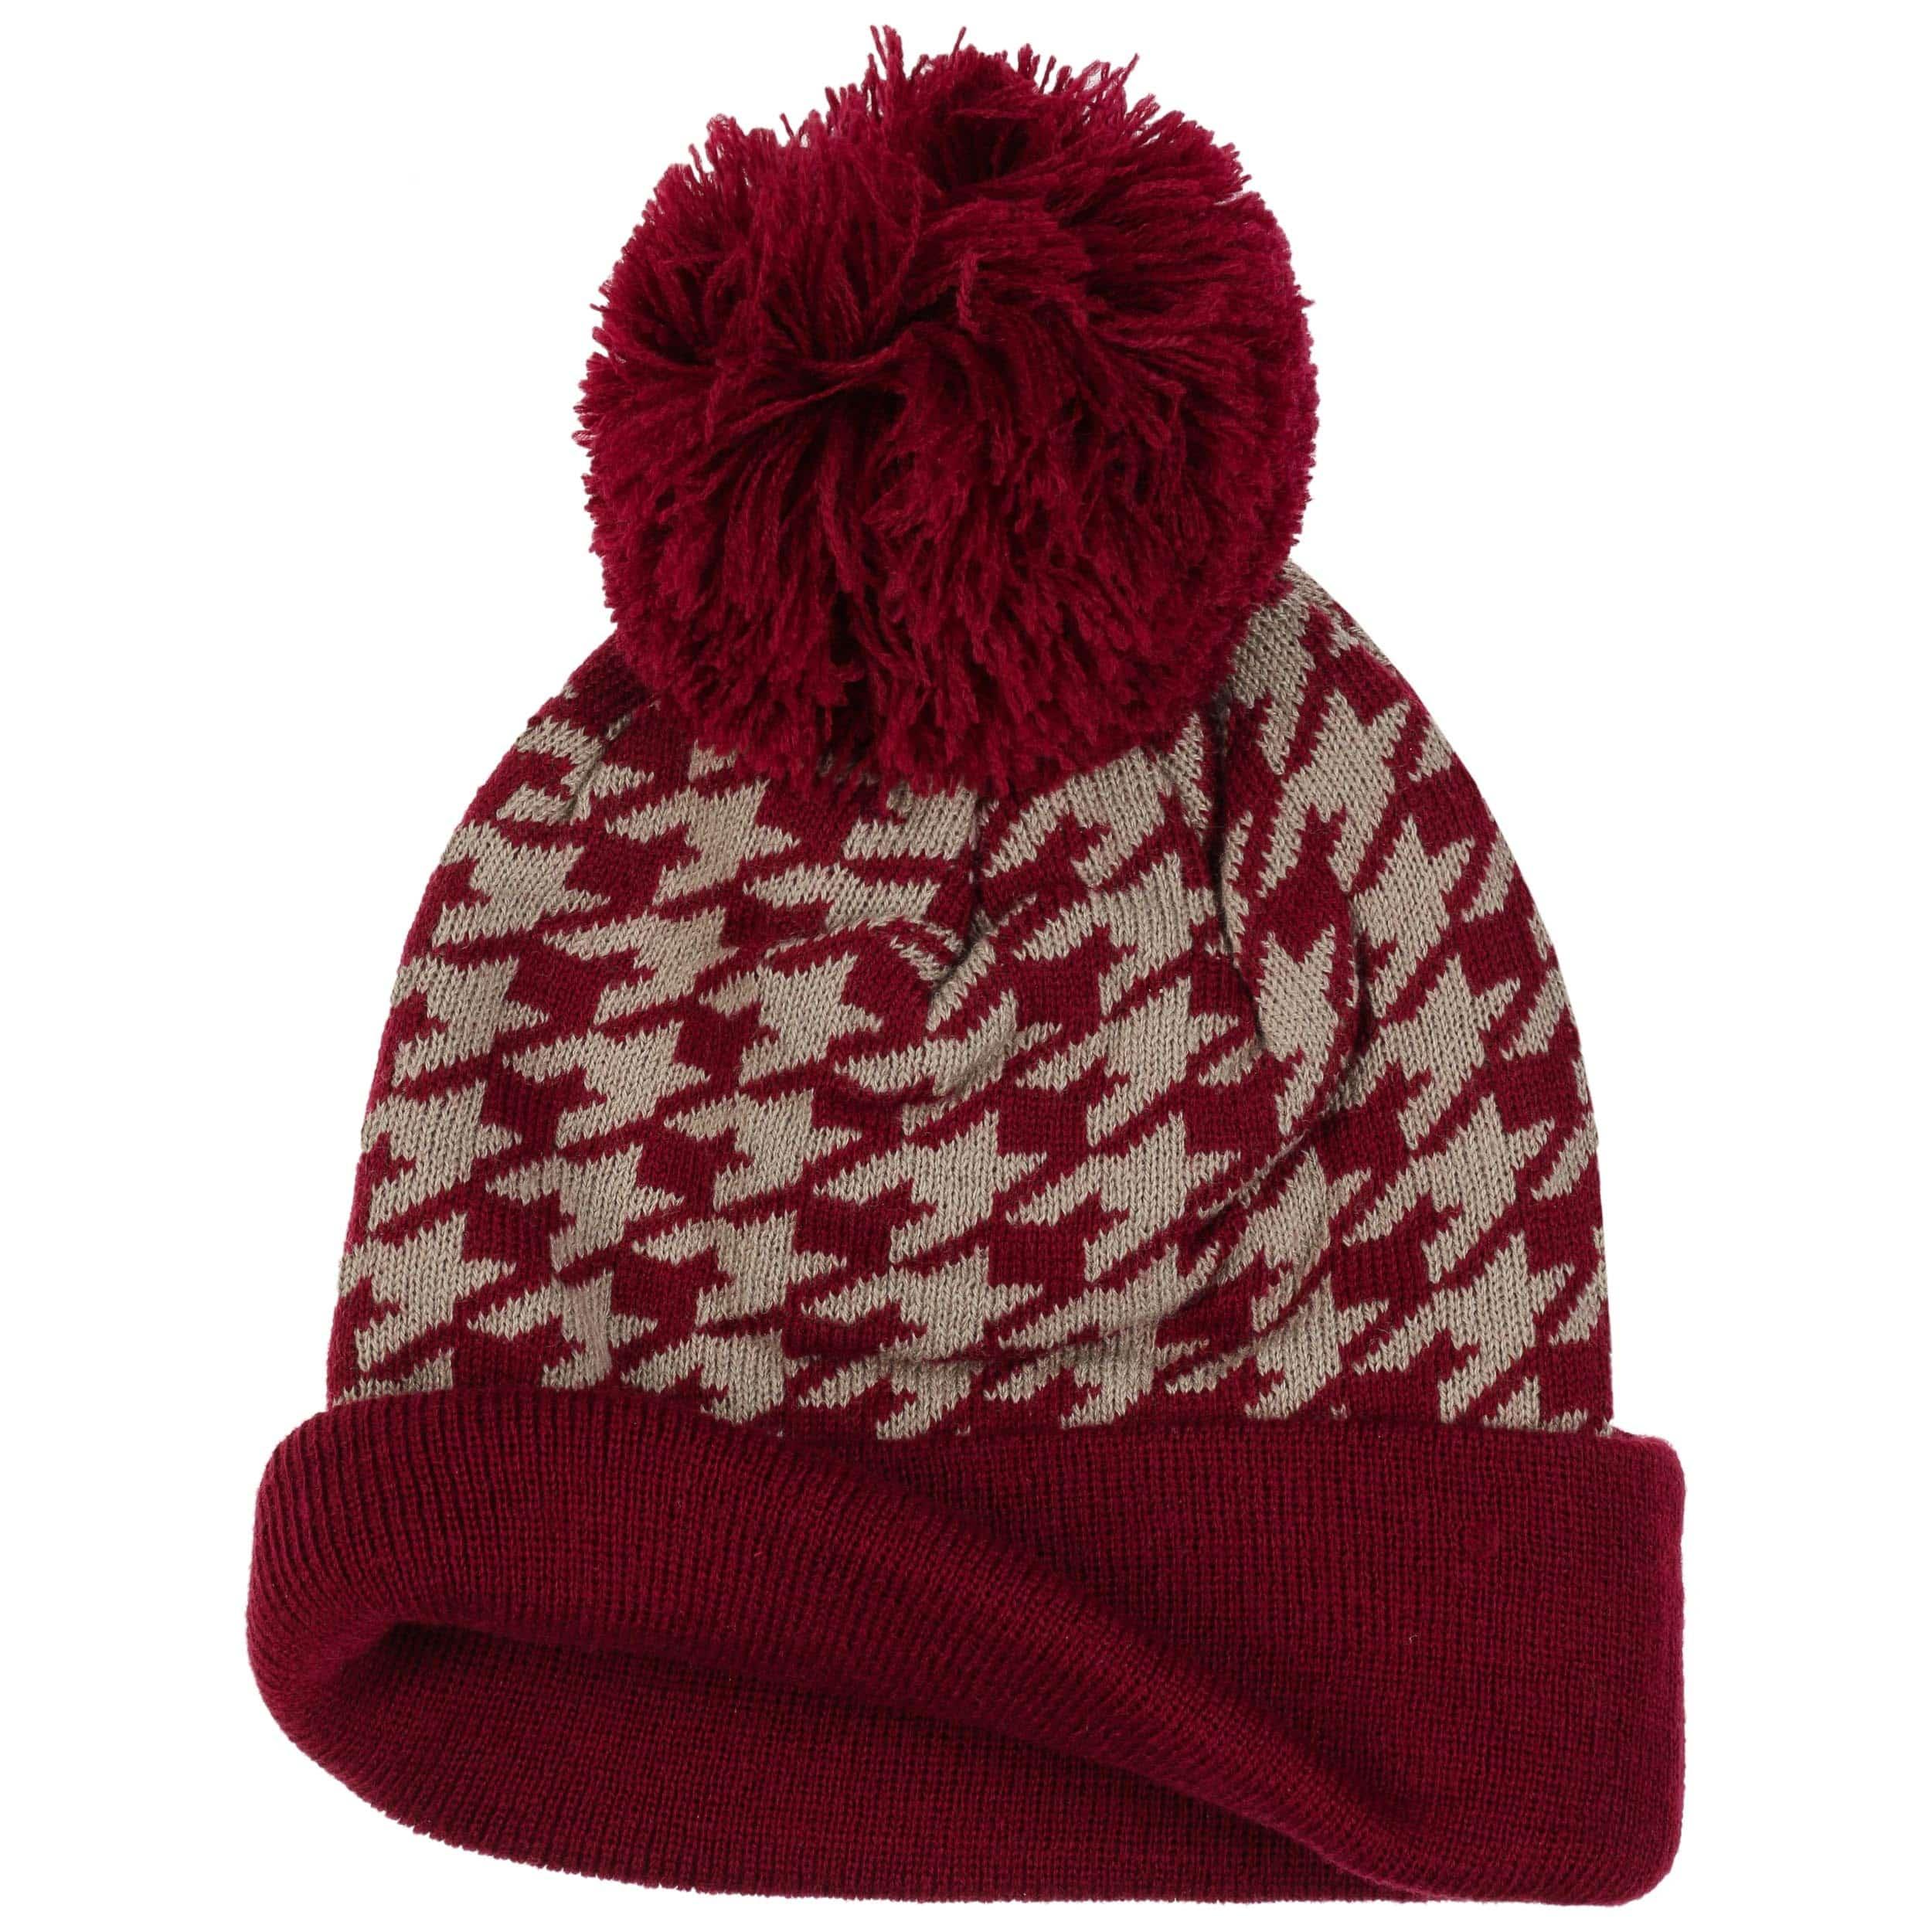 298ff6e3679 Houndstooth Pompom Hat - navy 1 · Houndstooth Pompom Hat - bordeaux 1 ...